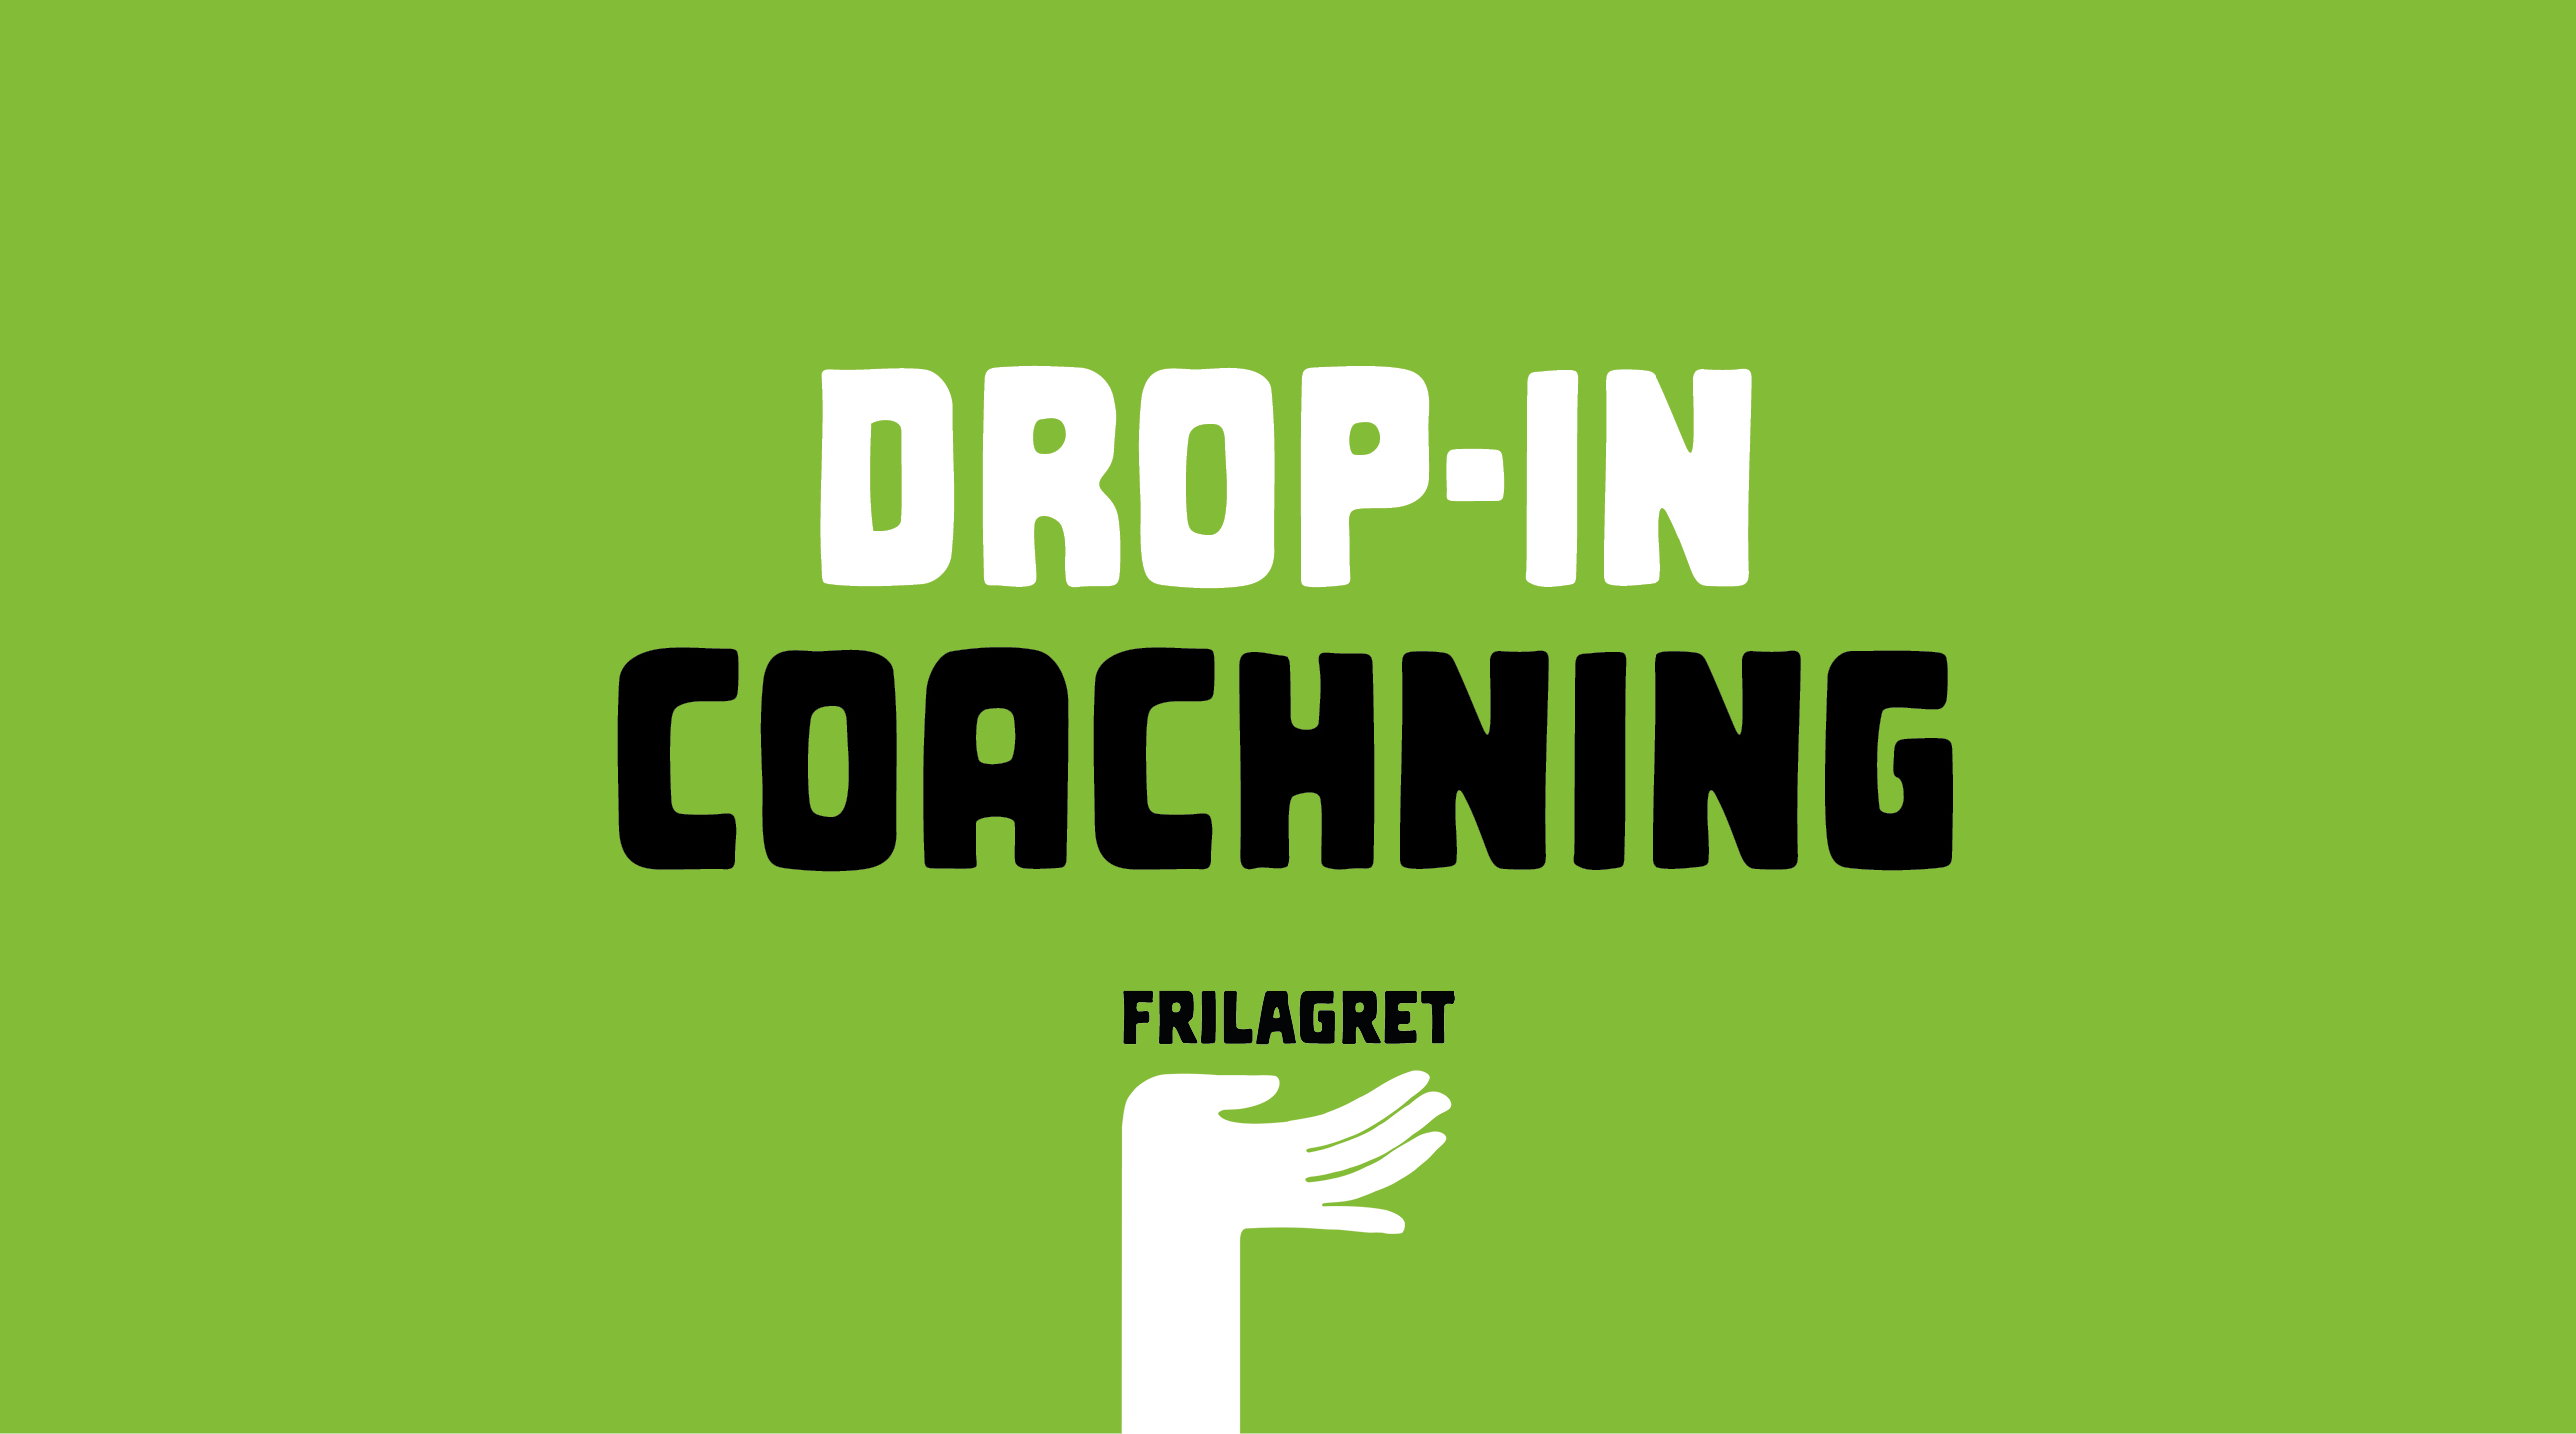 Drop-in coachning